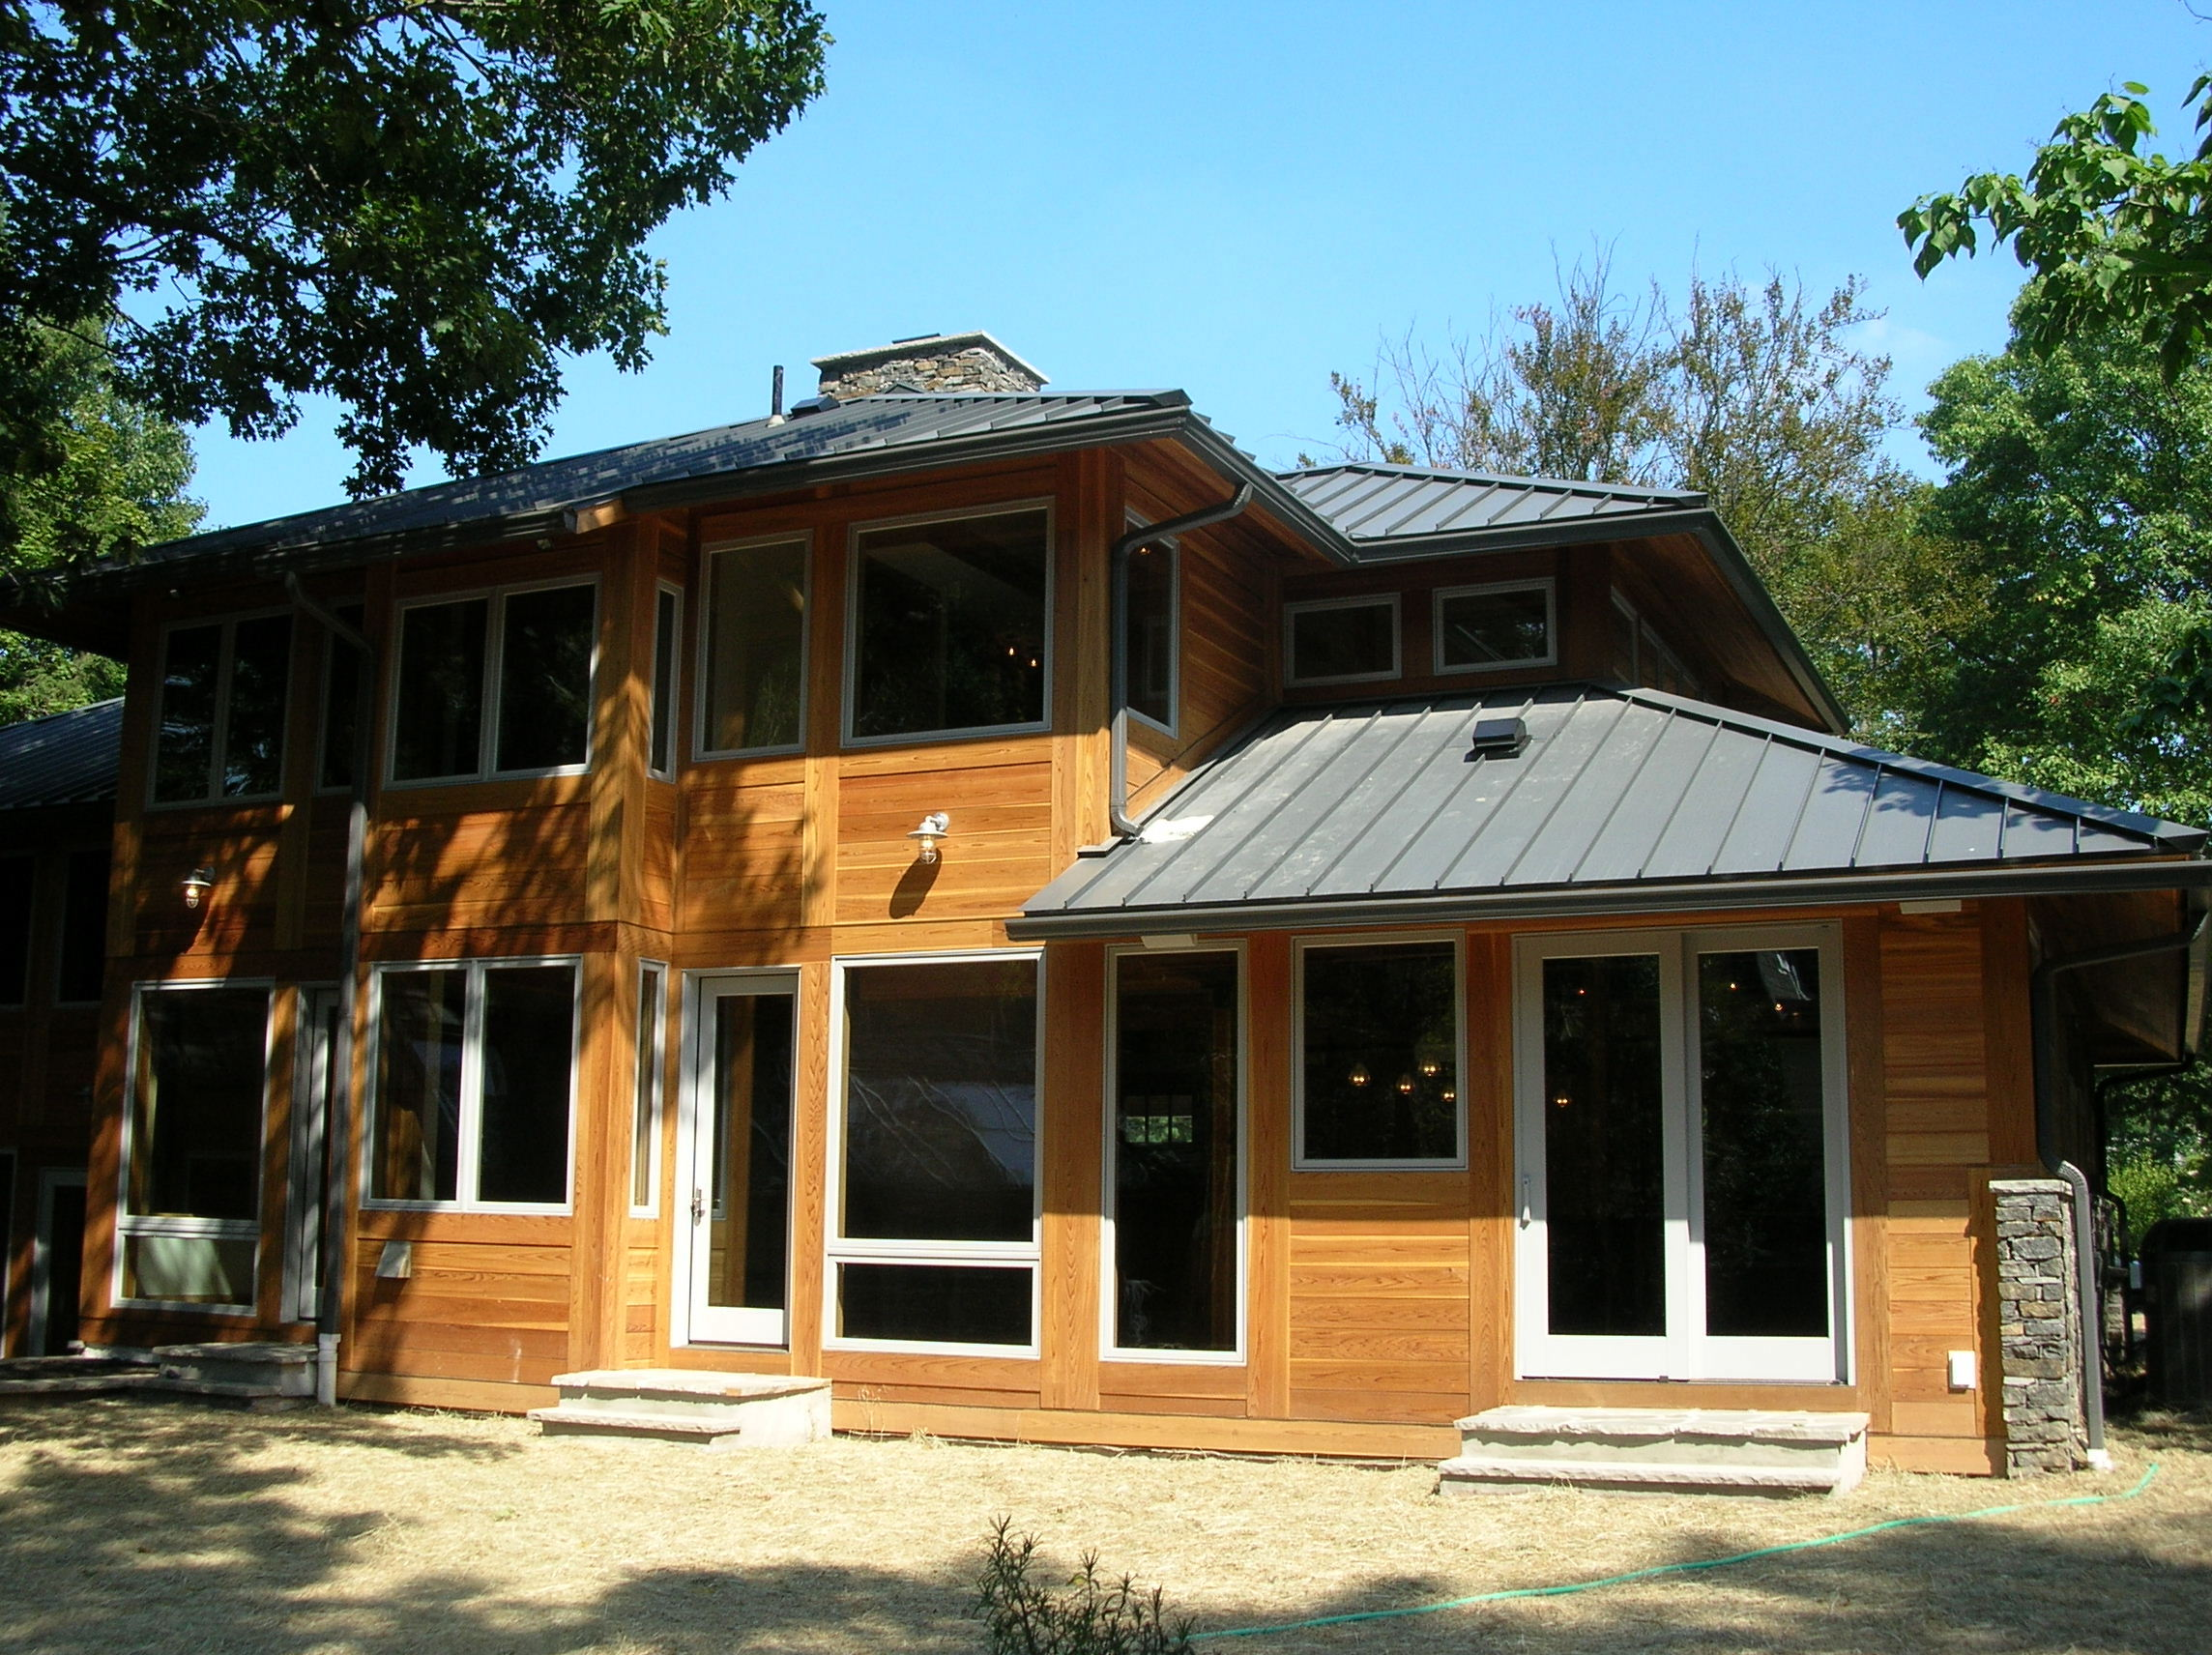 Price Rear Moden Front Wood Garage Doors Wood Siding Stone Base Metal Roof.jpg